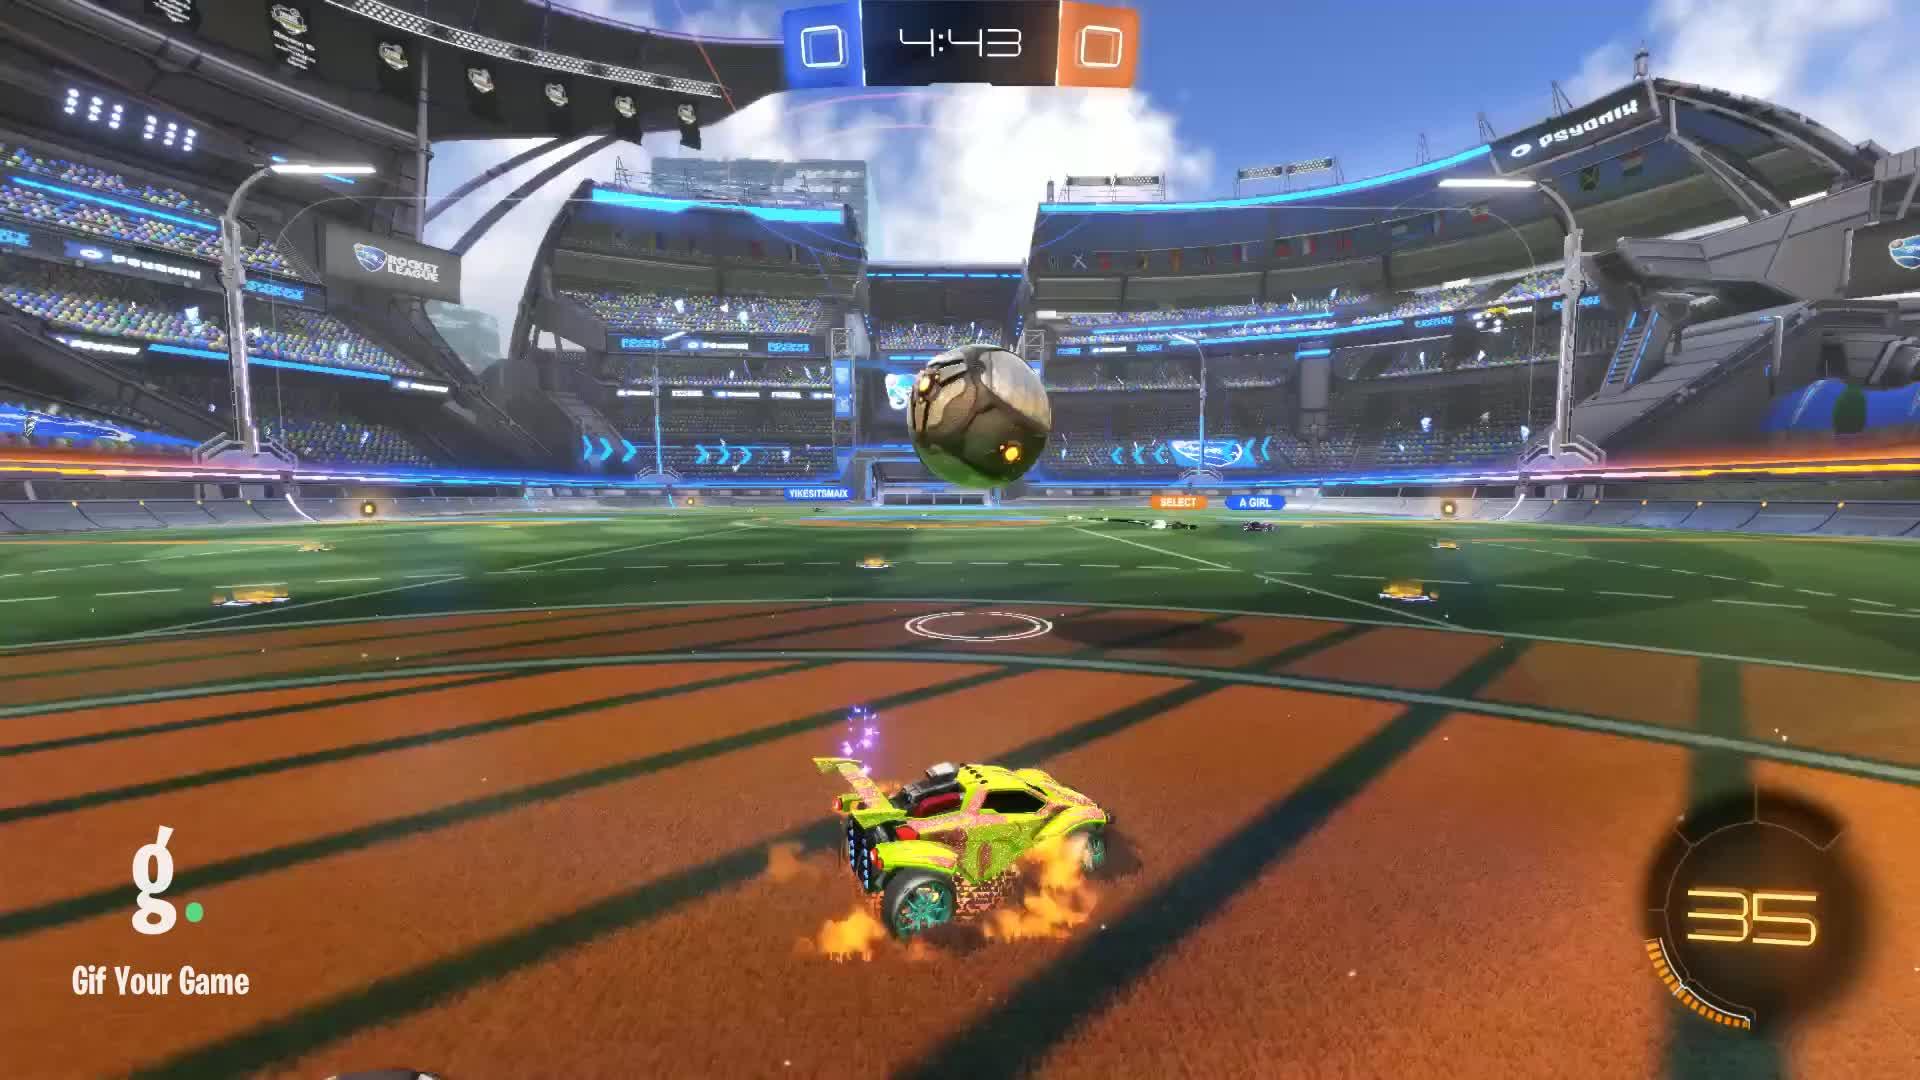 Gif Your Game, GifYourGame, Goal, Millsi, Rocket League, RocketLeague, Remixed Goal 1: Millsi GIFs